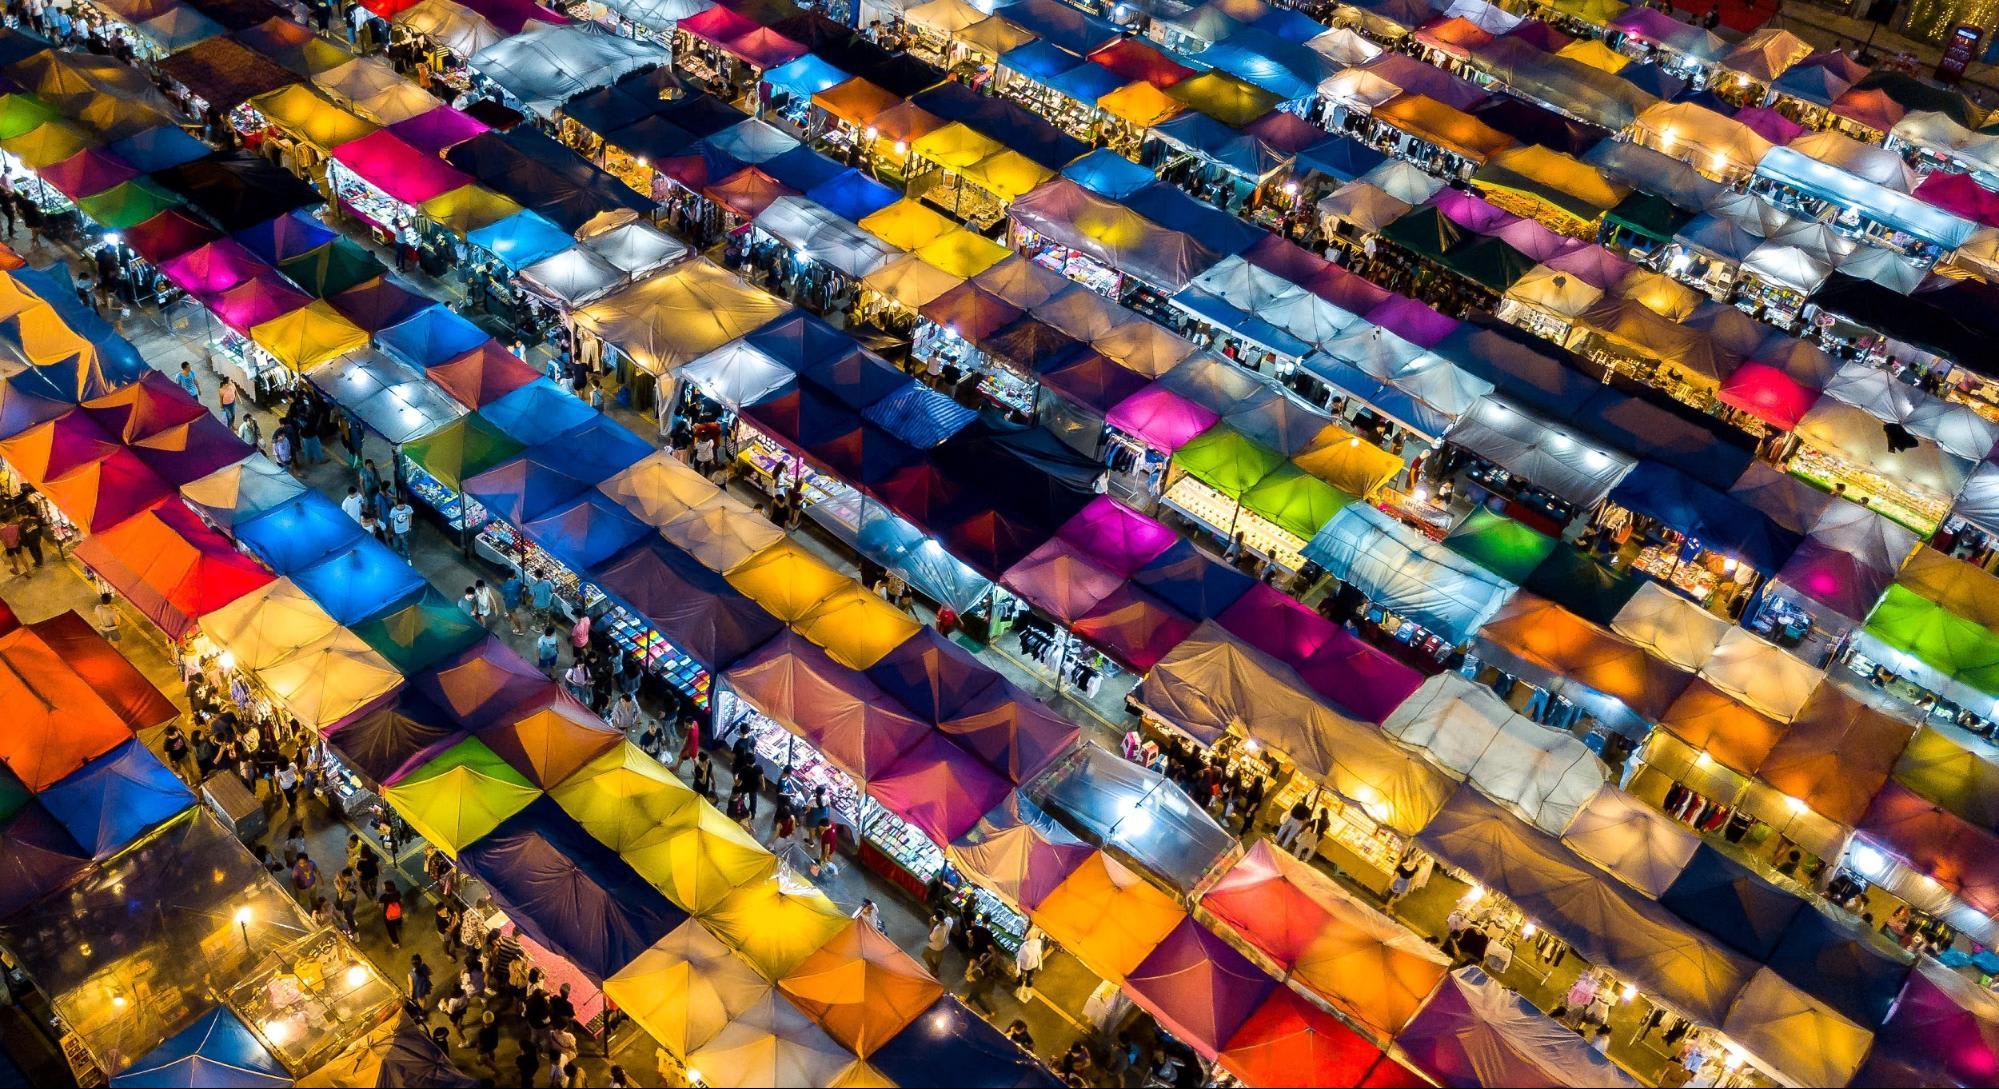 Bangkok Shopping Rot Fai Market